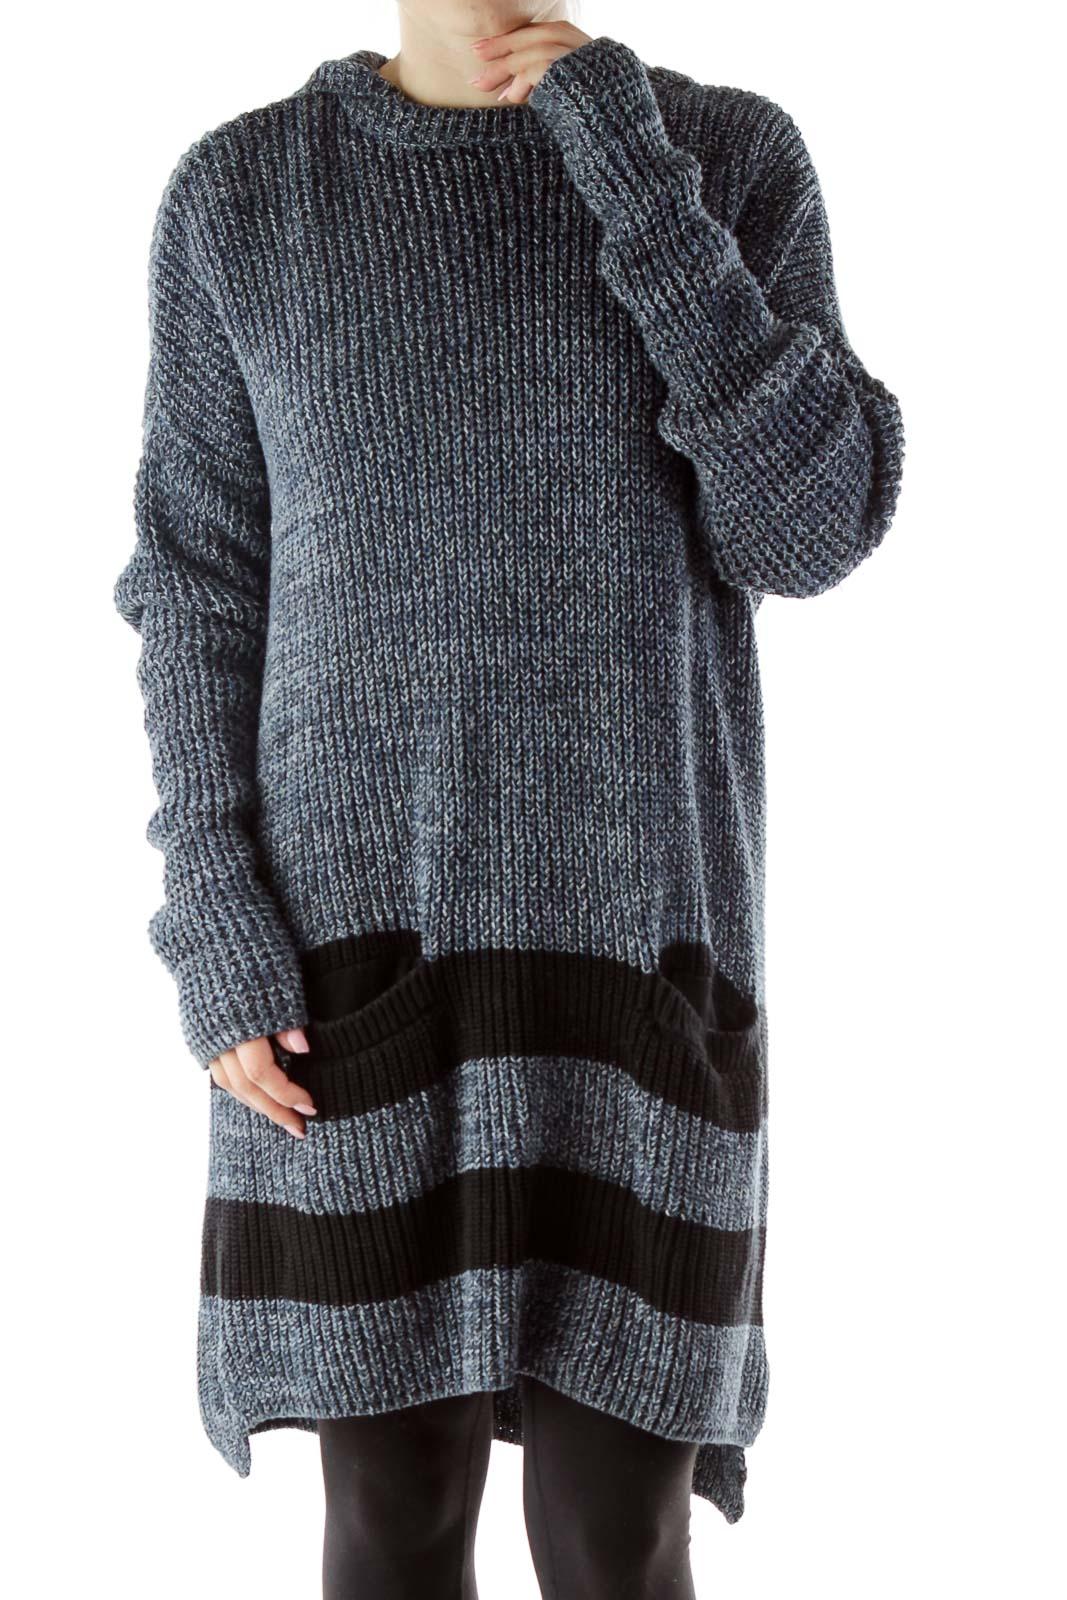 Navy Hooded Knit Dress